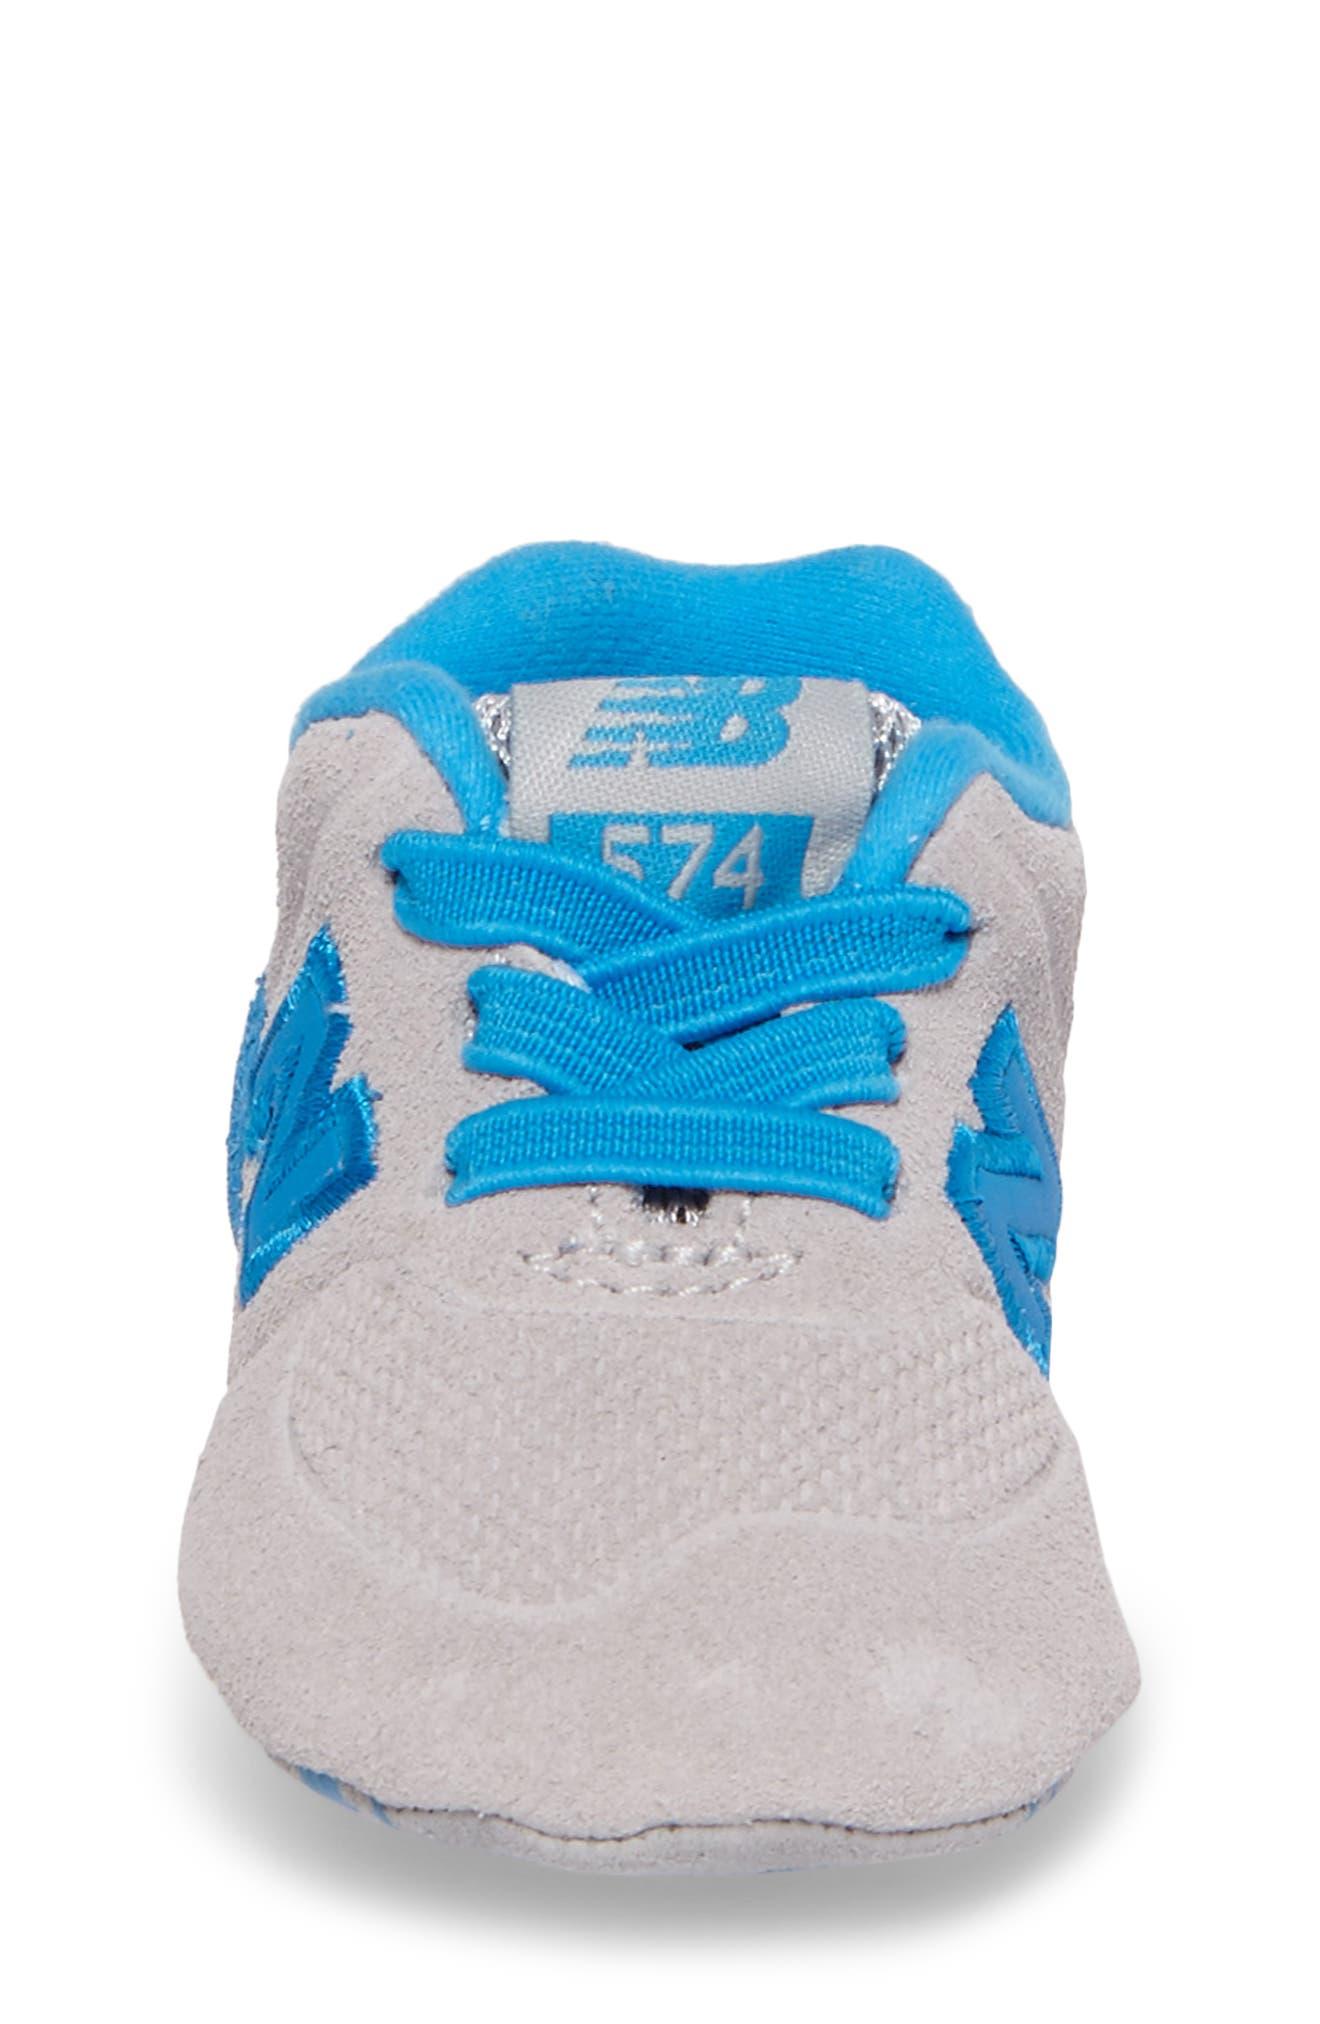 547 Crib Shoe,                             Alternate thumbnail 4, color,                             Blue/ Grey